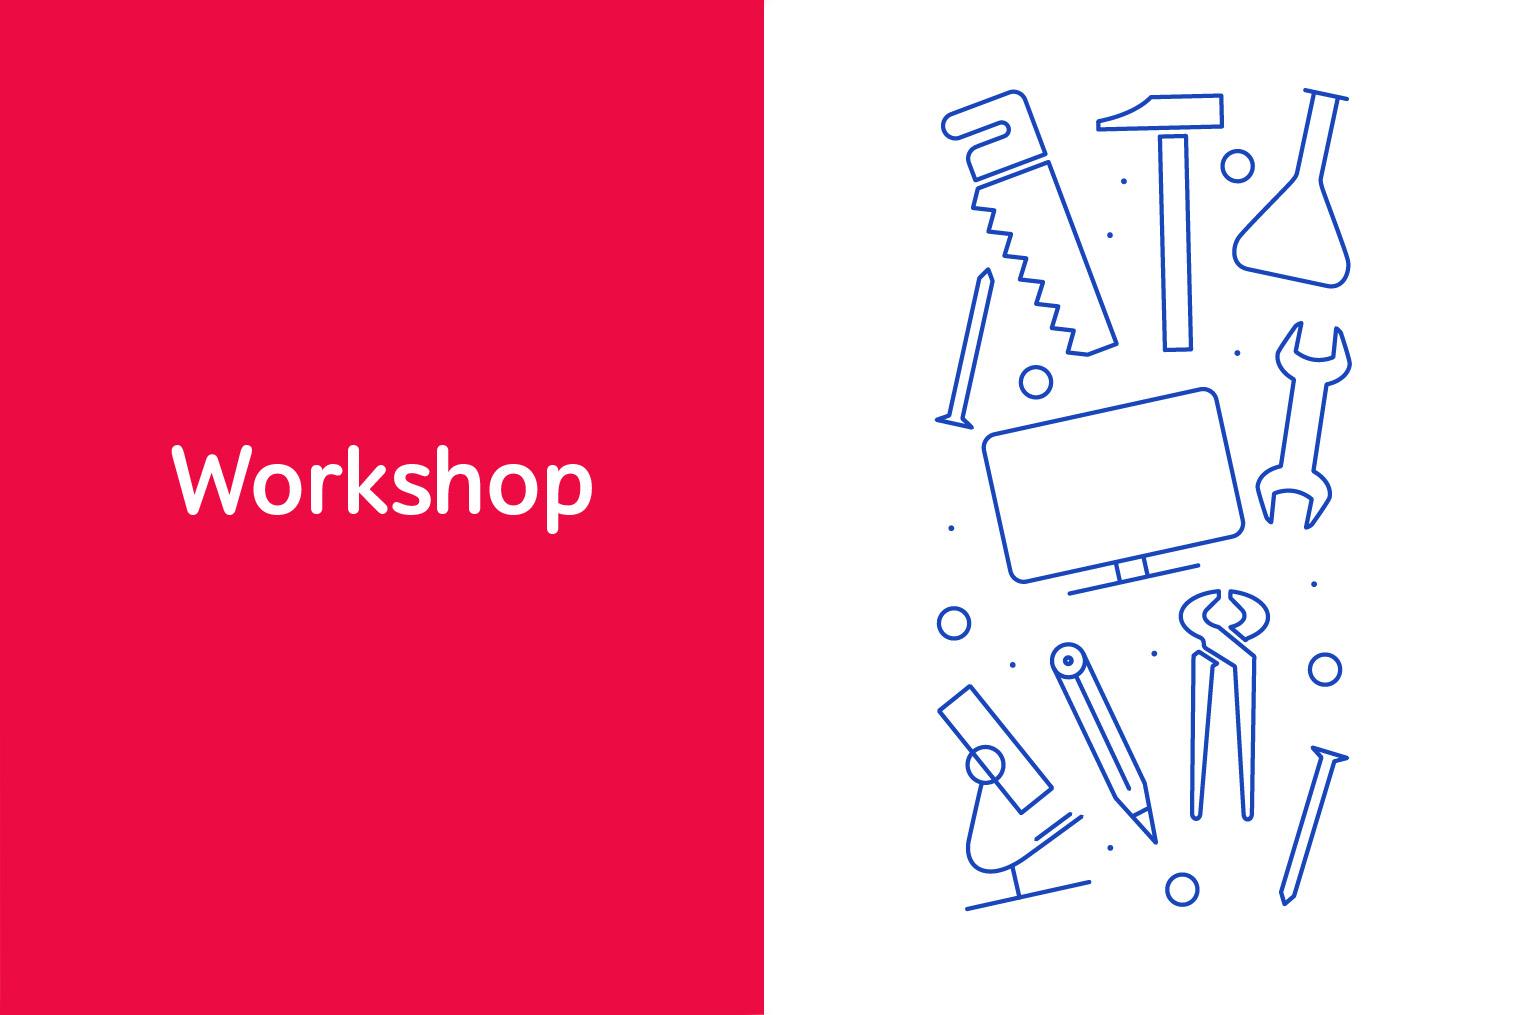 SCAMT Workshop Week: international workshop on nanotechnologies